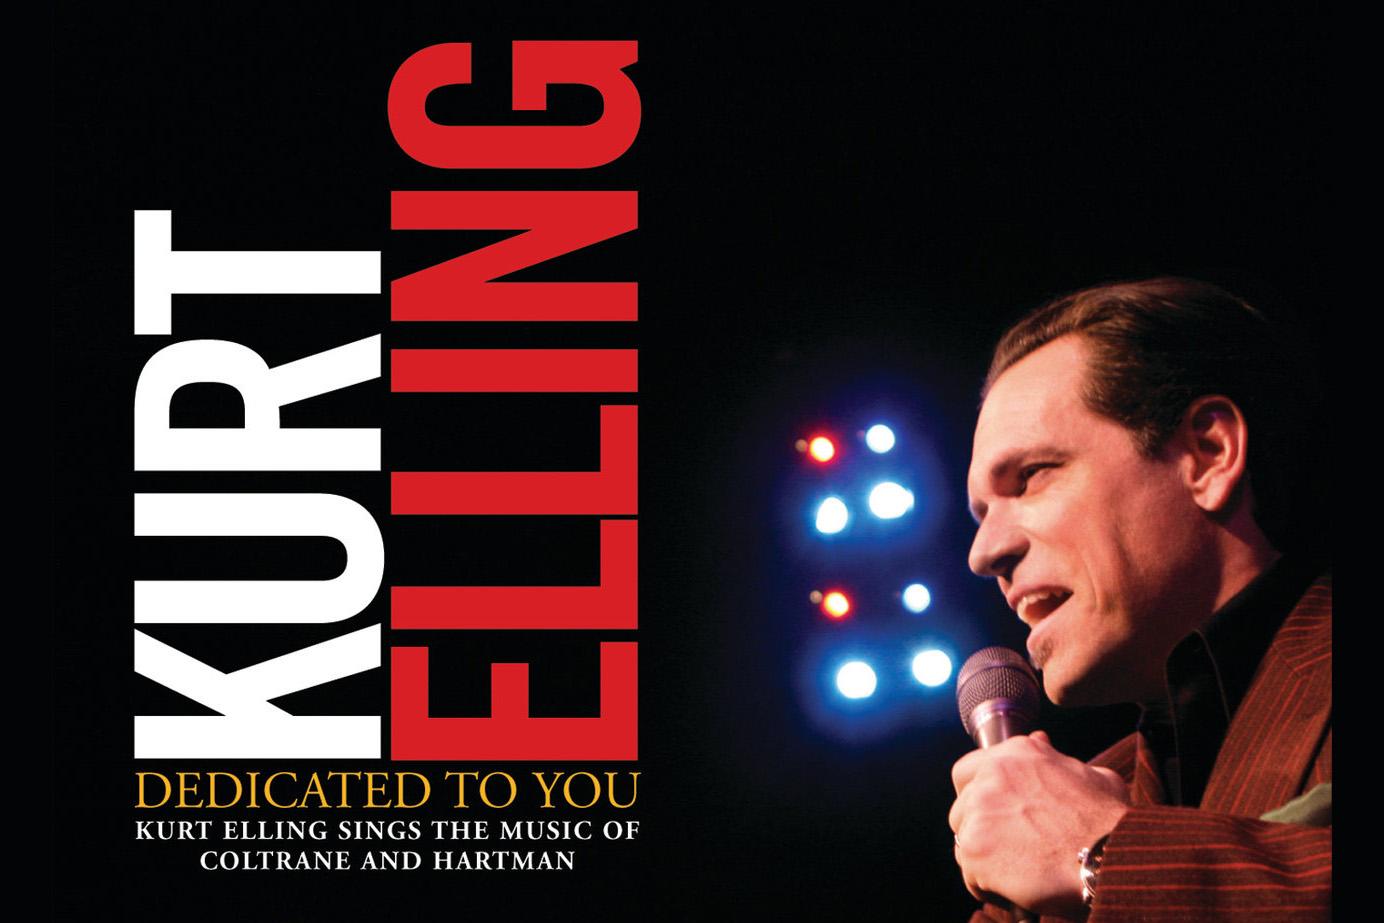 Kurt Elling - Dedicated to You